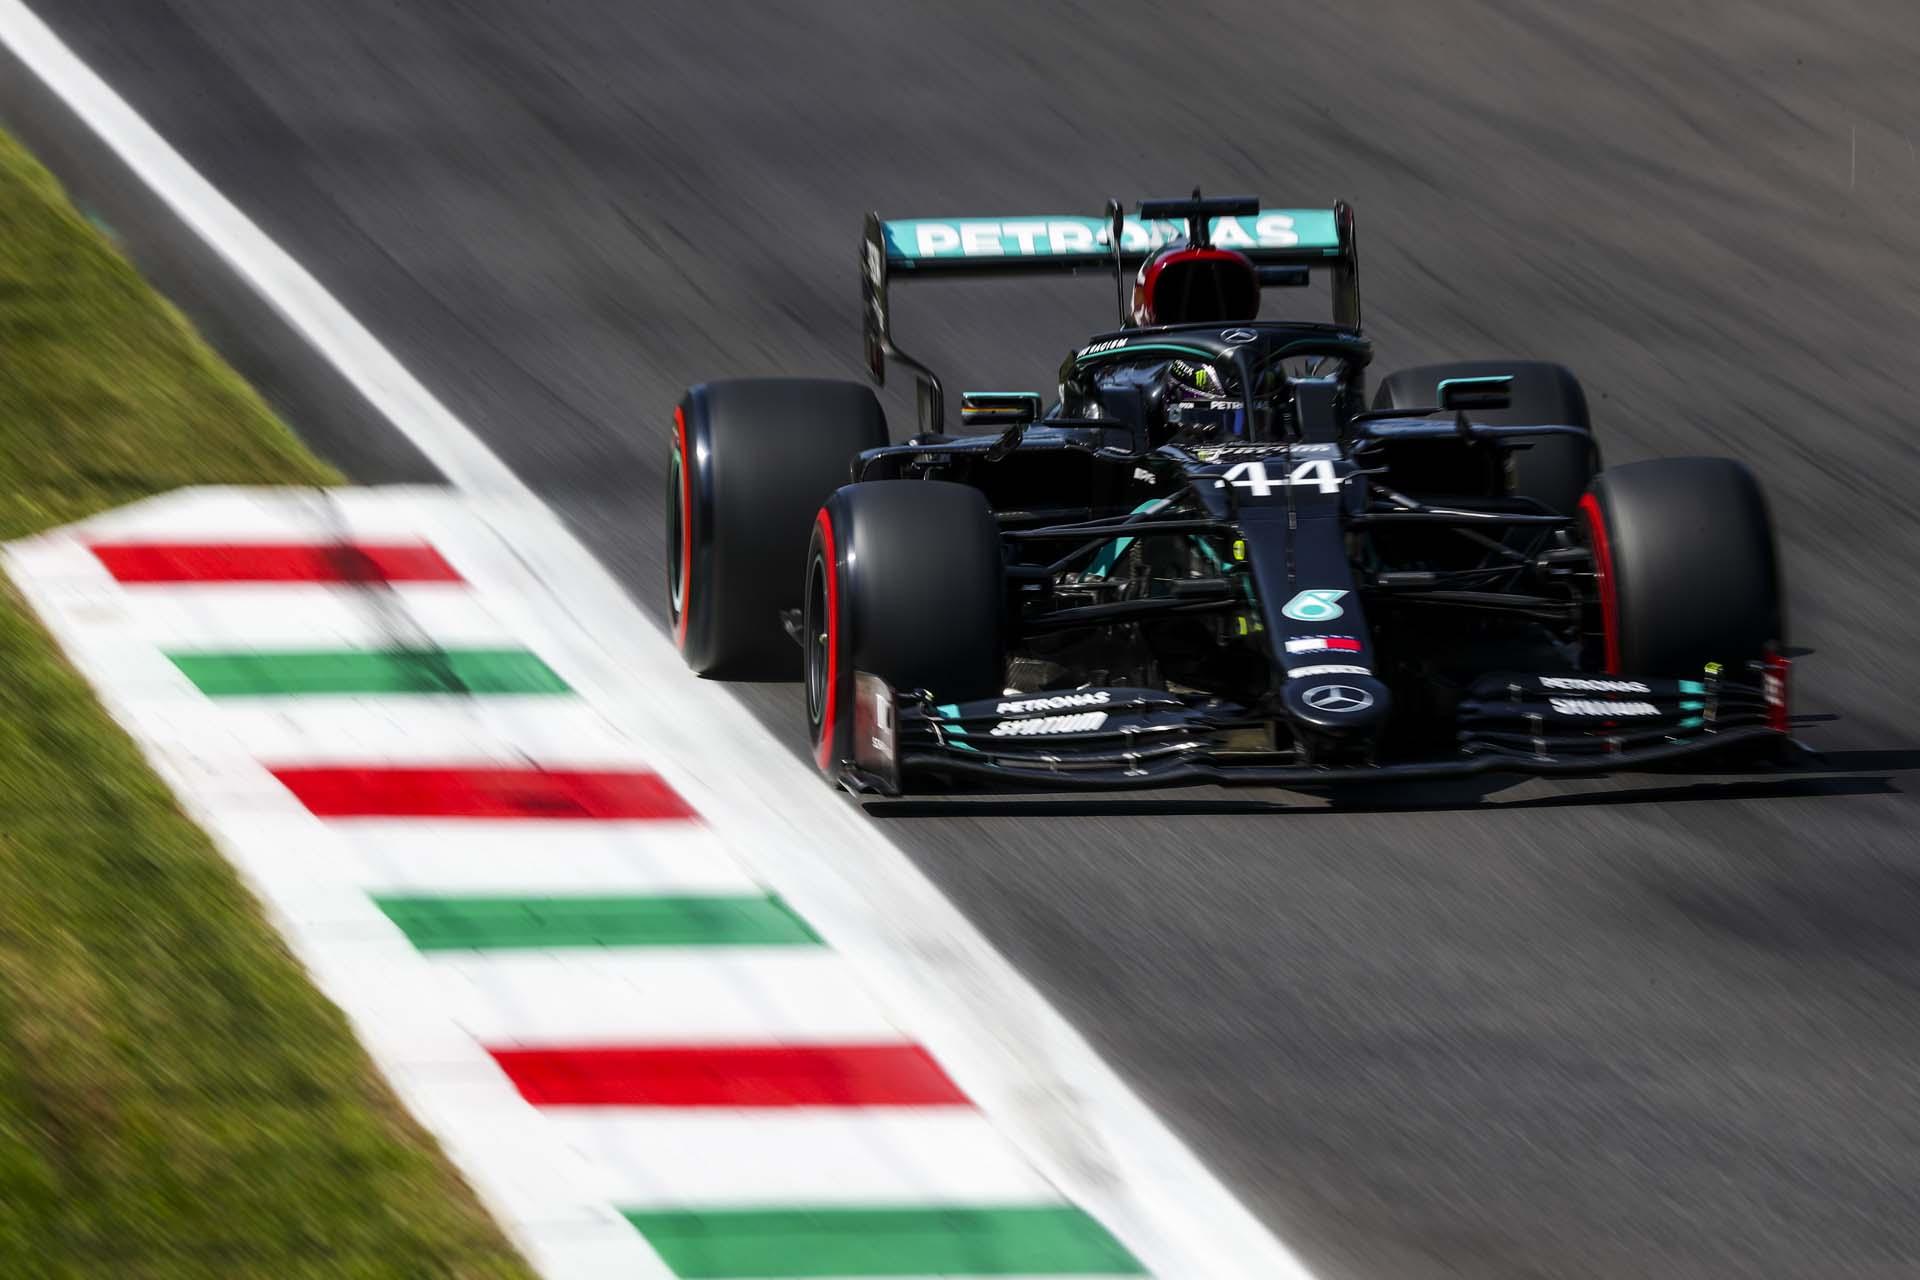 2020 Italian Grand Prix, Saturday - LAT Images